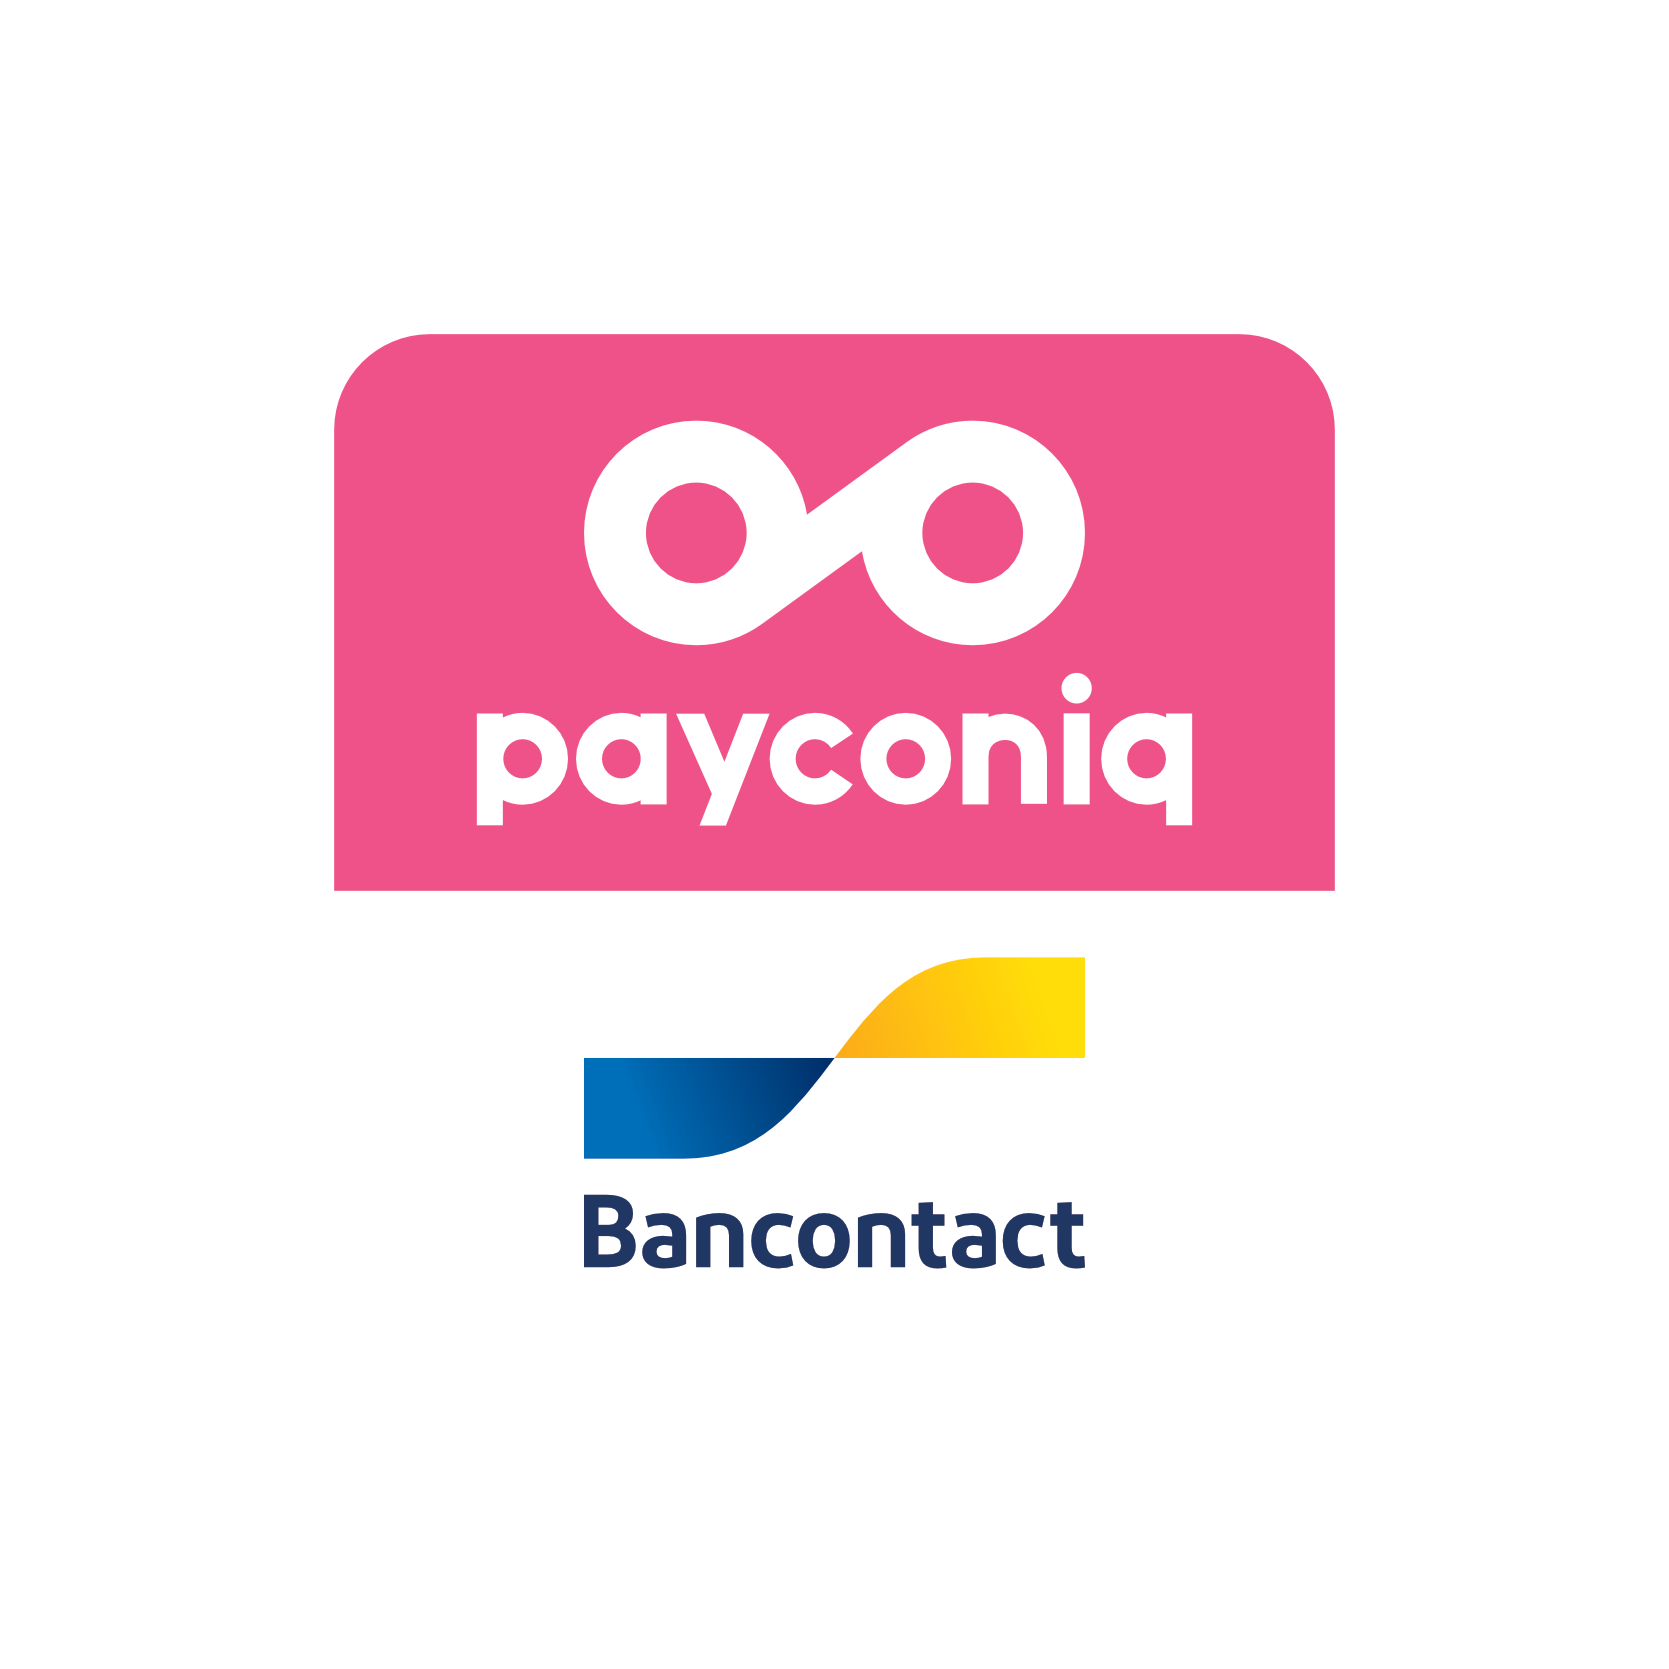 payconiq_by_Bancontact-logo-app-pos